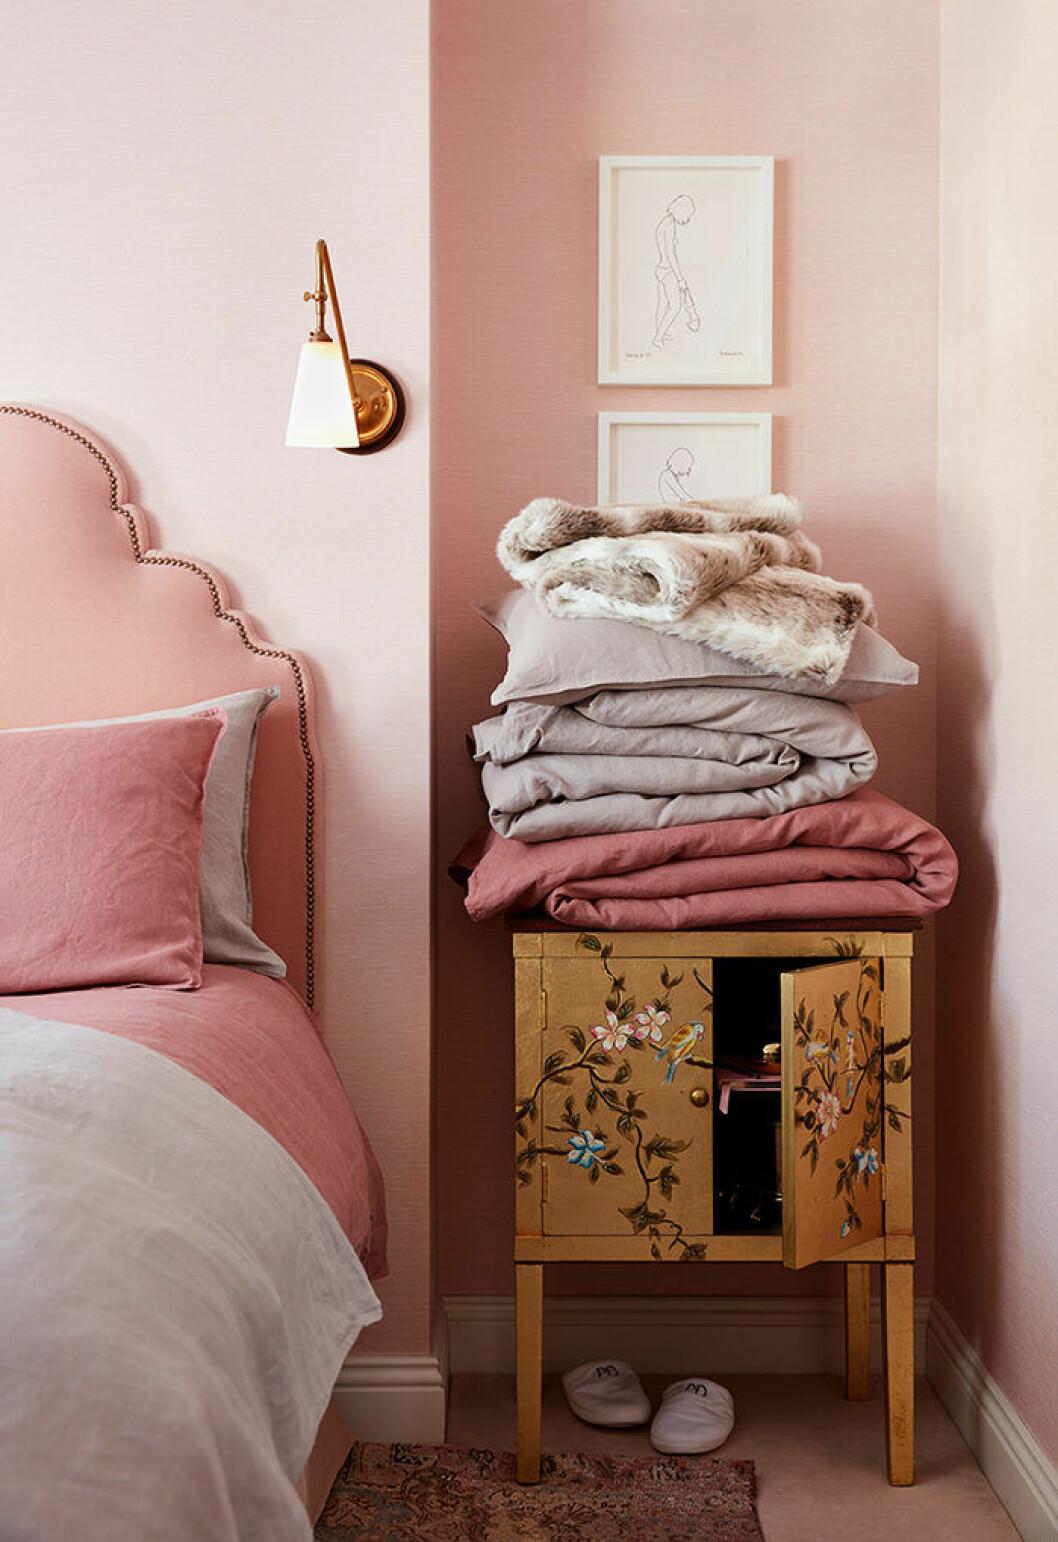 Poppy Delevingnes sovrum går i ljusrosa toner